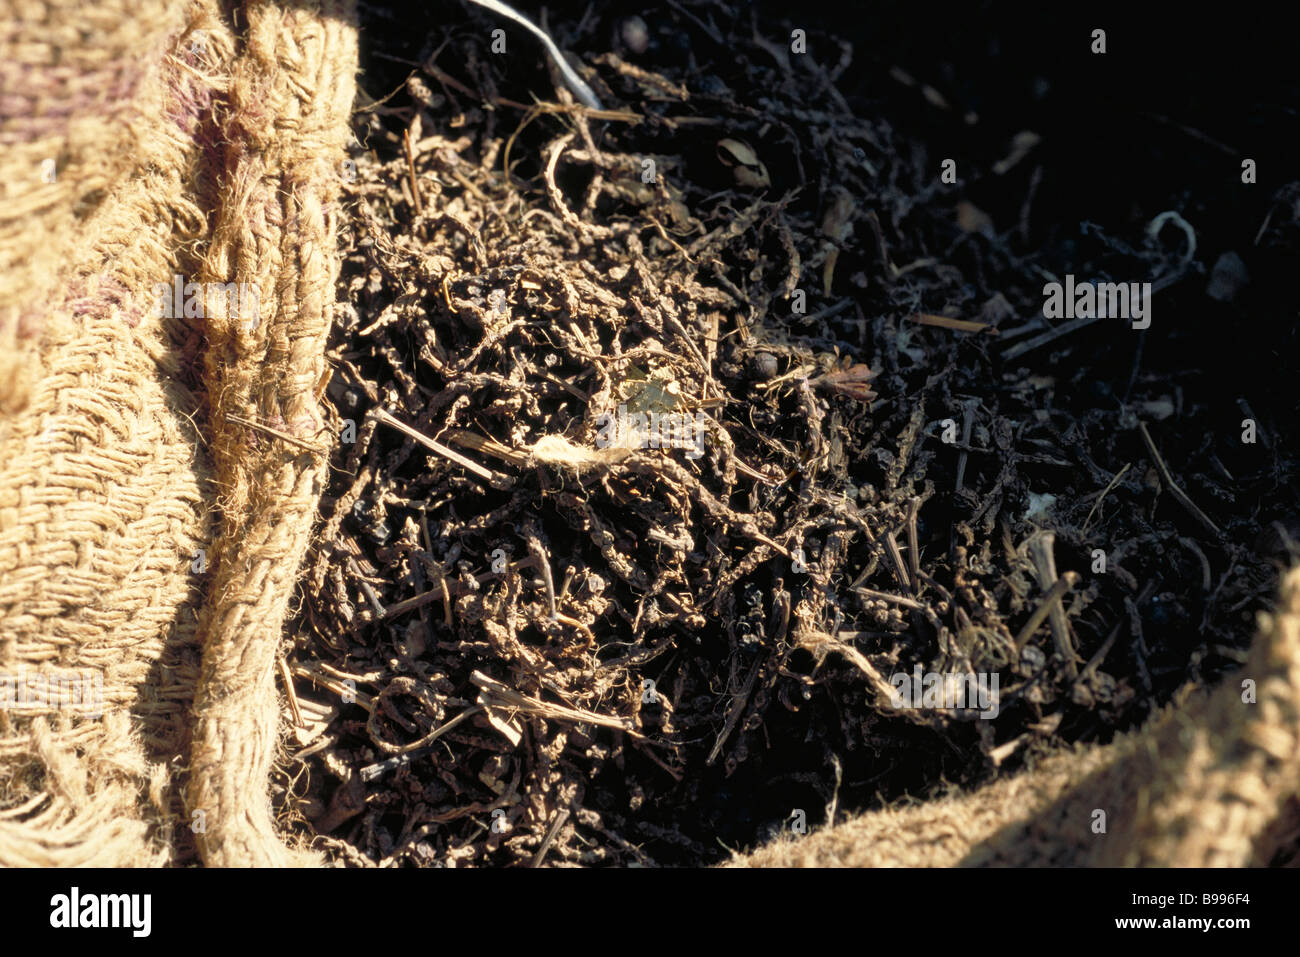 Twigs in burlap bag, close-up - Stock Image